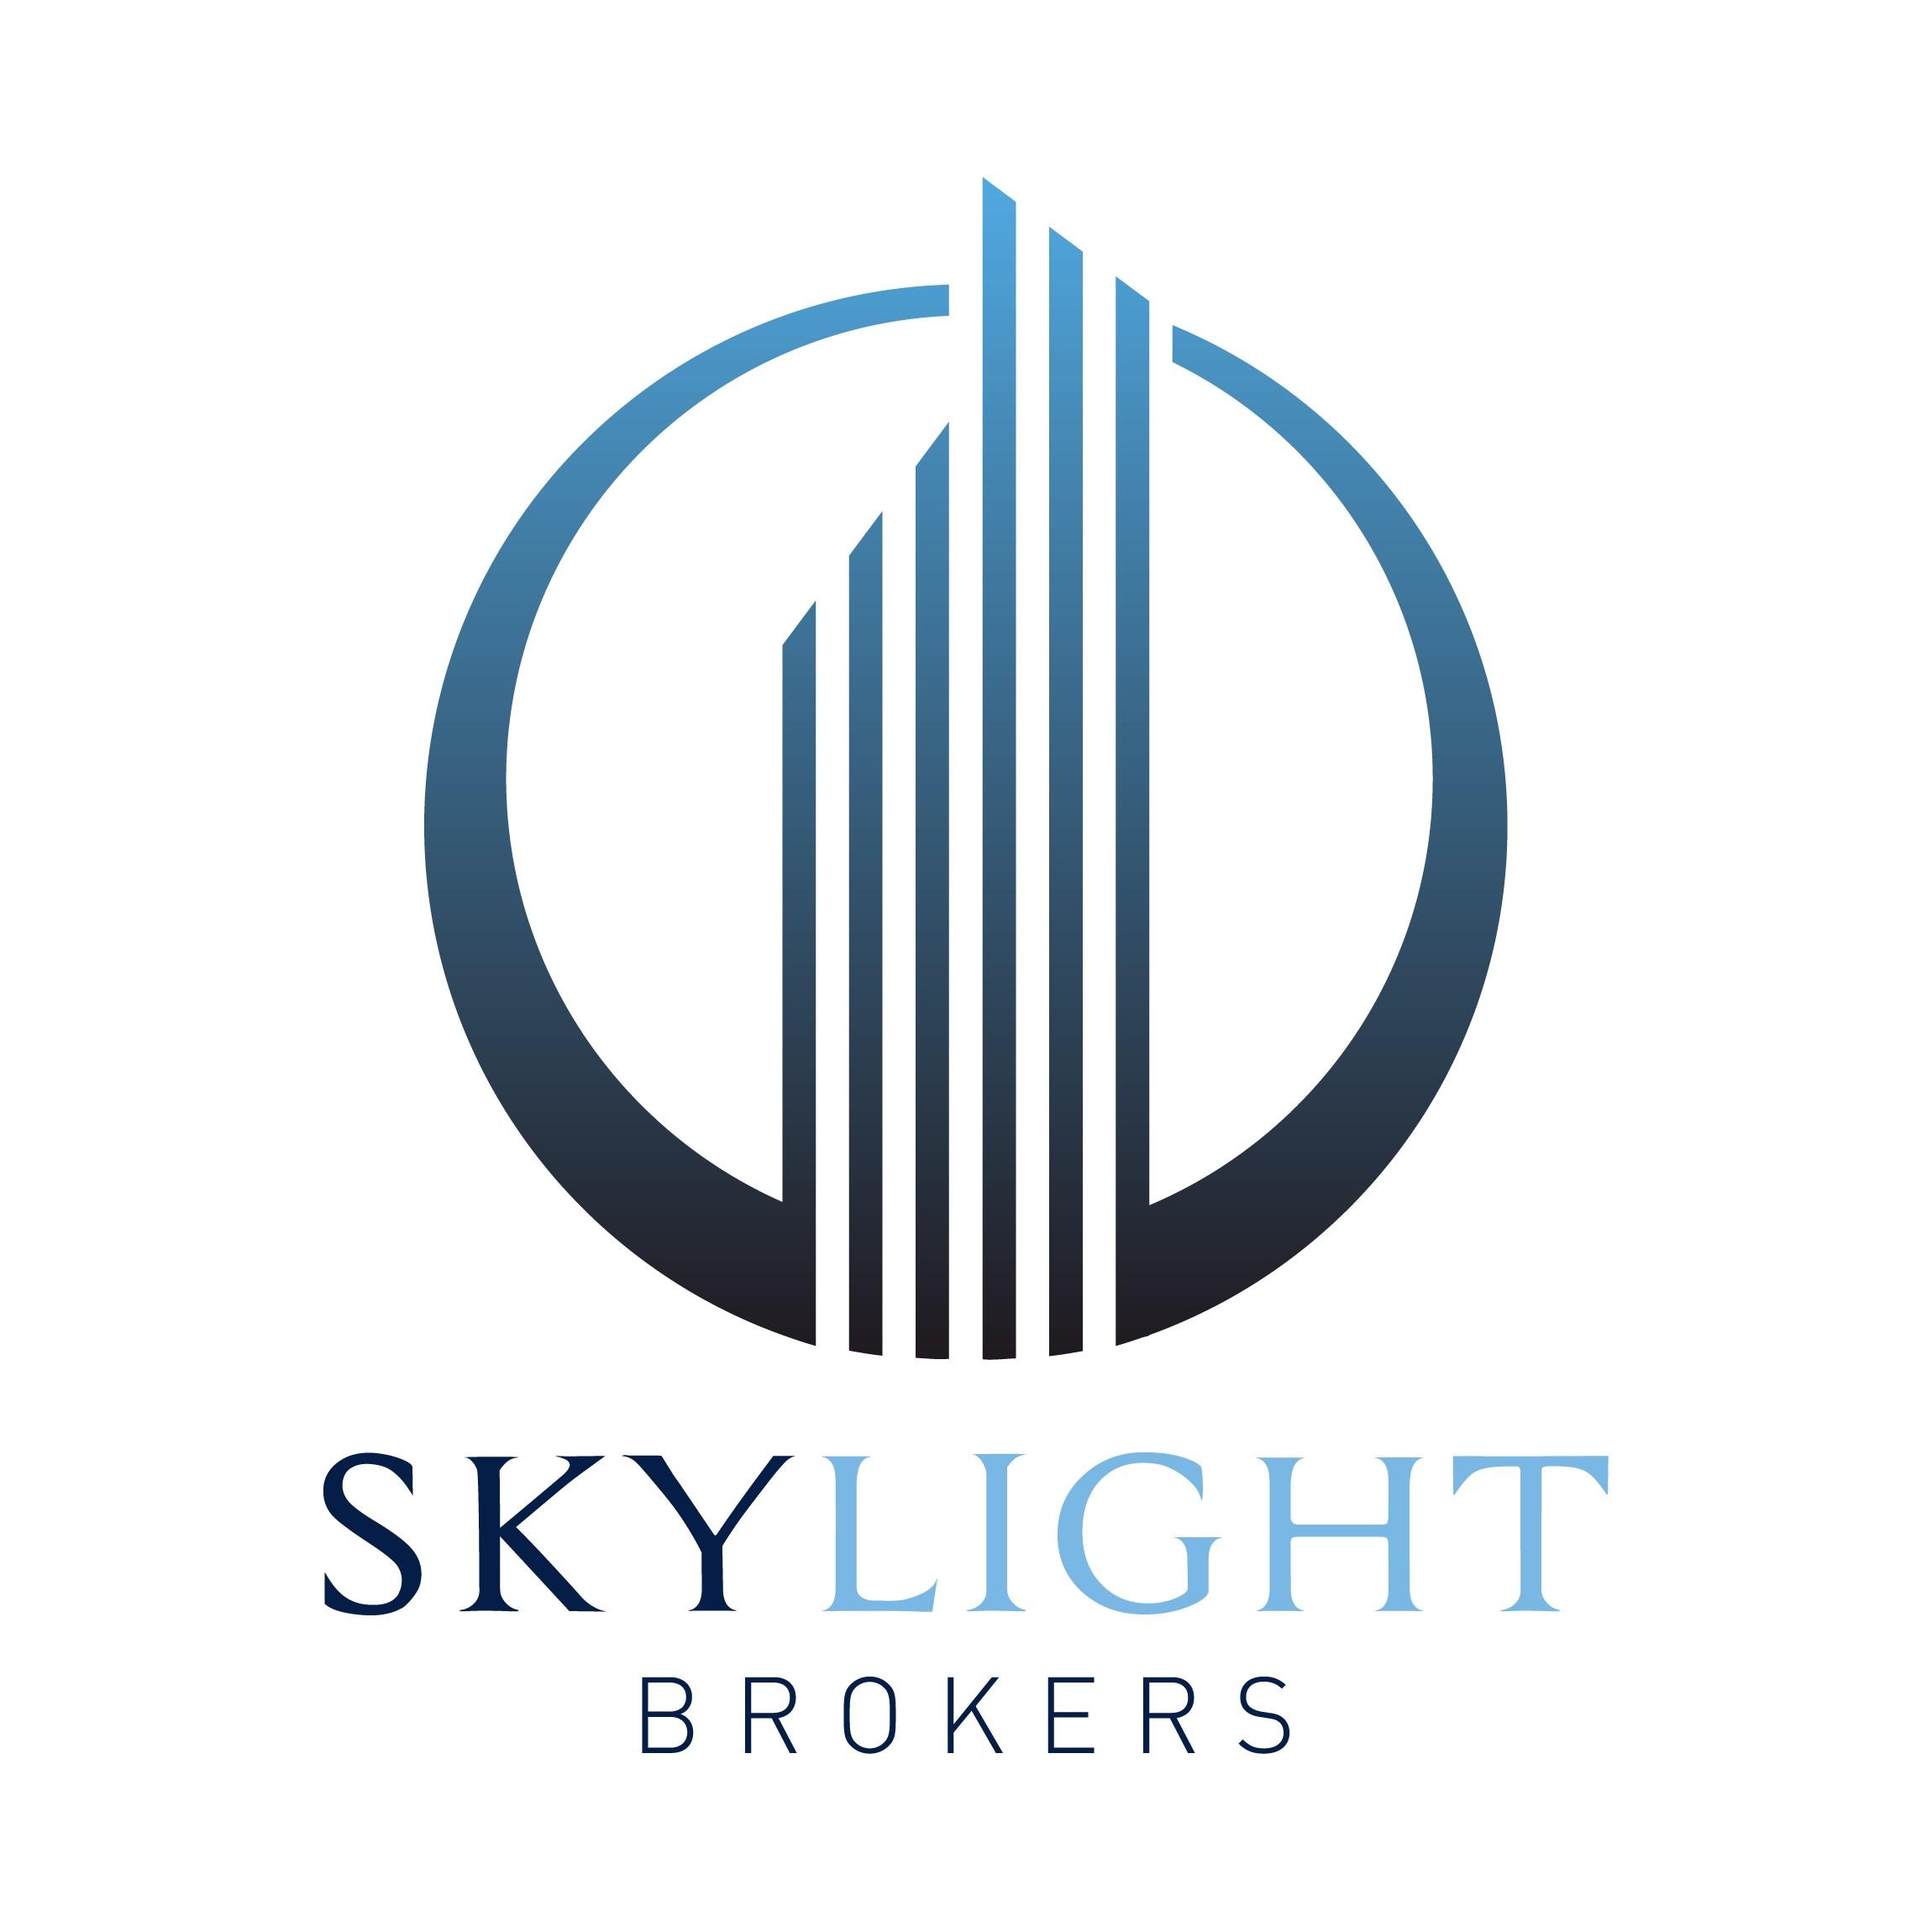 Skylight Brokers logo